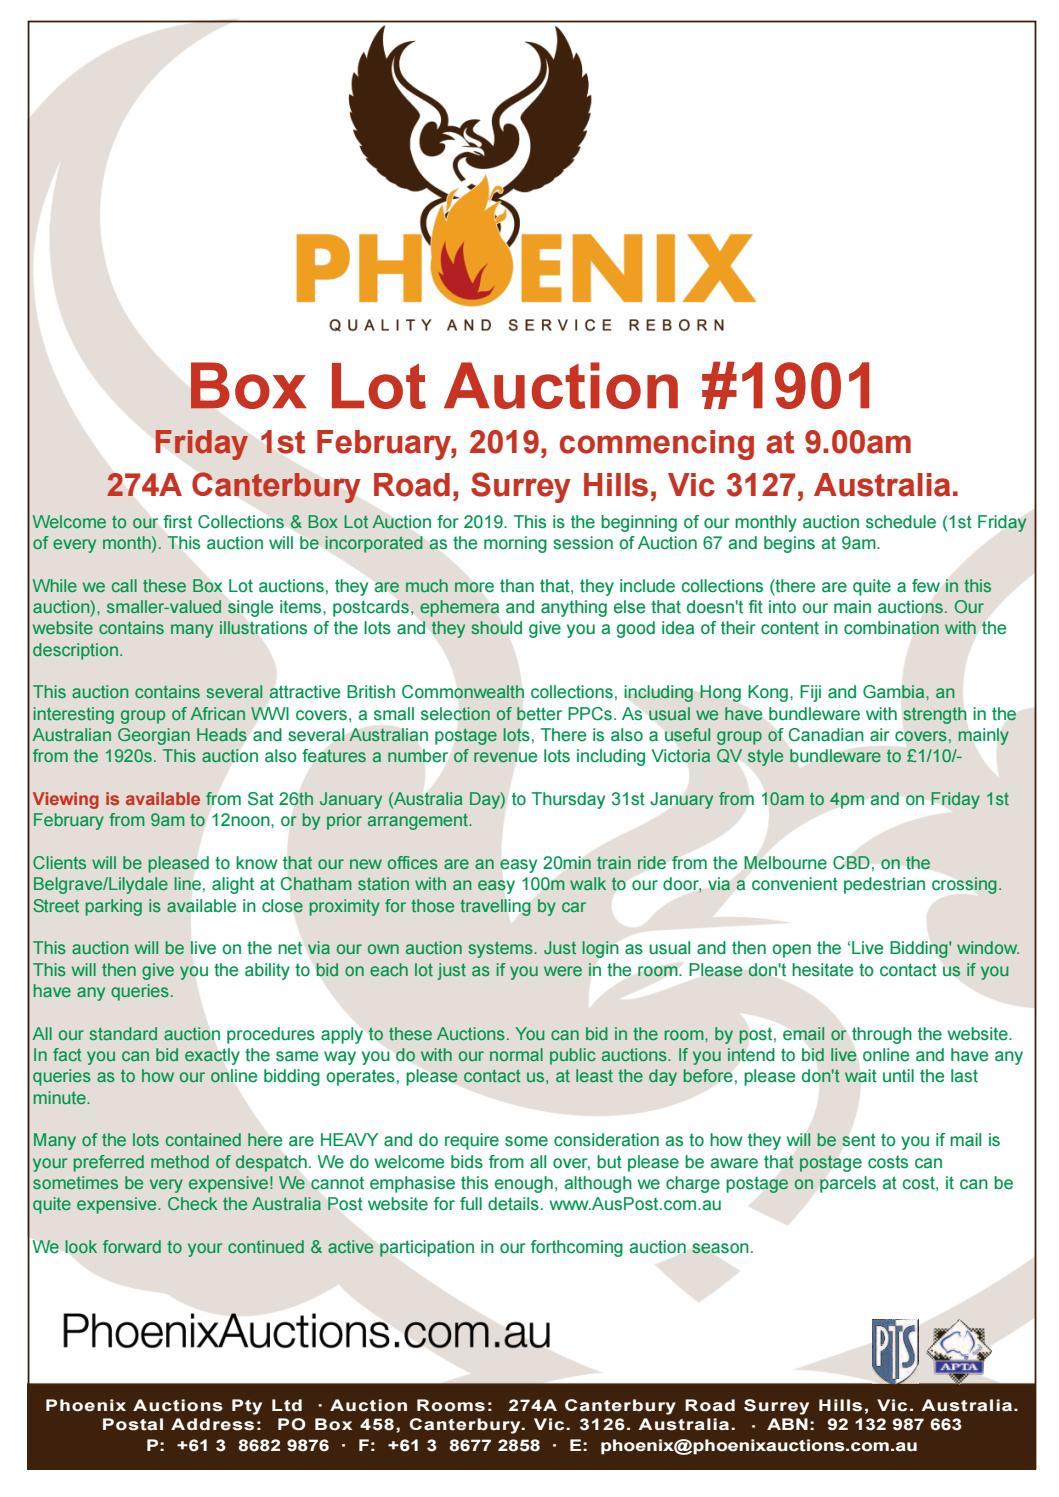 Phoeinix Auctions 1901 by Phoenix Auctions Pty Ltd - issuu